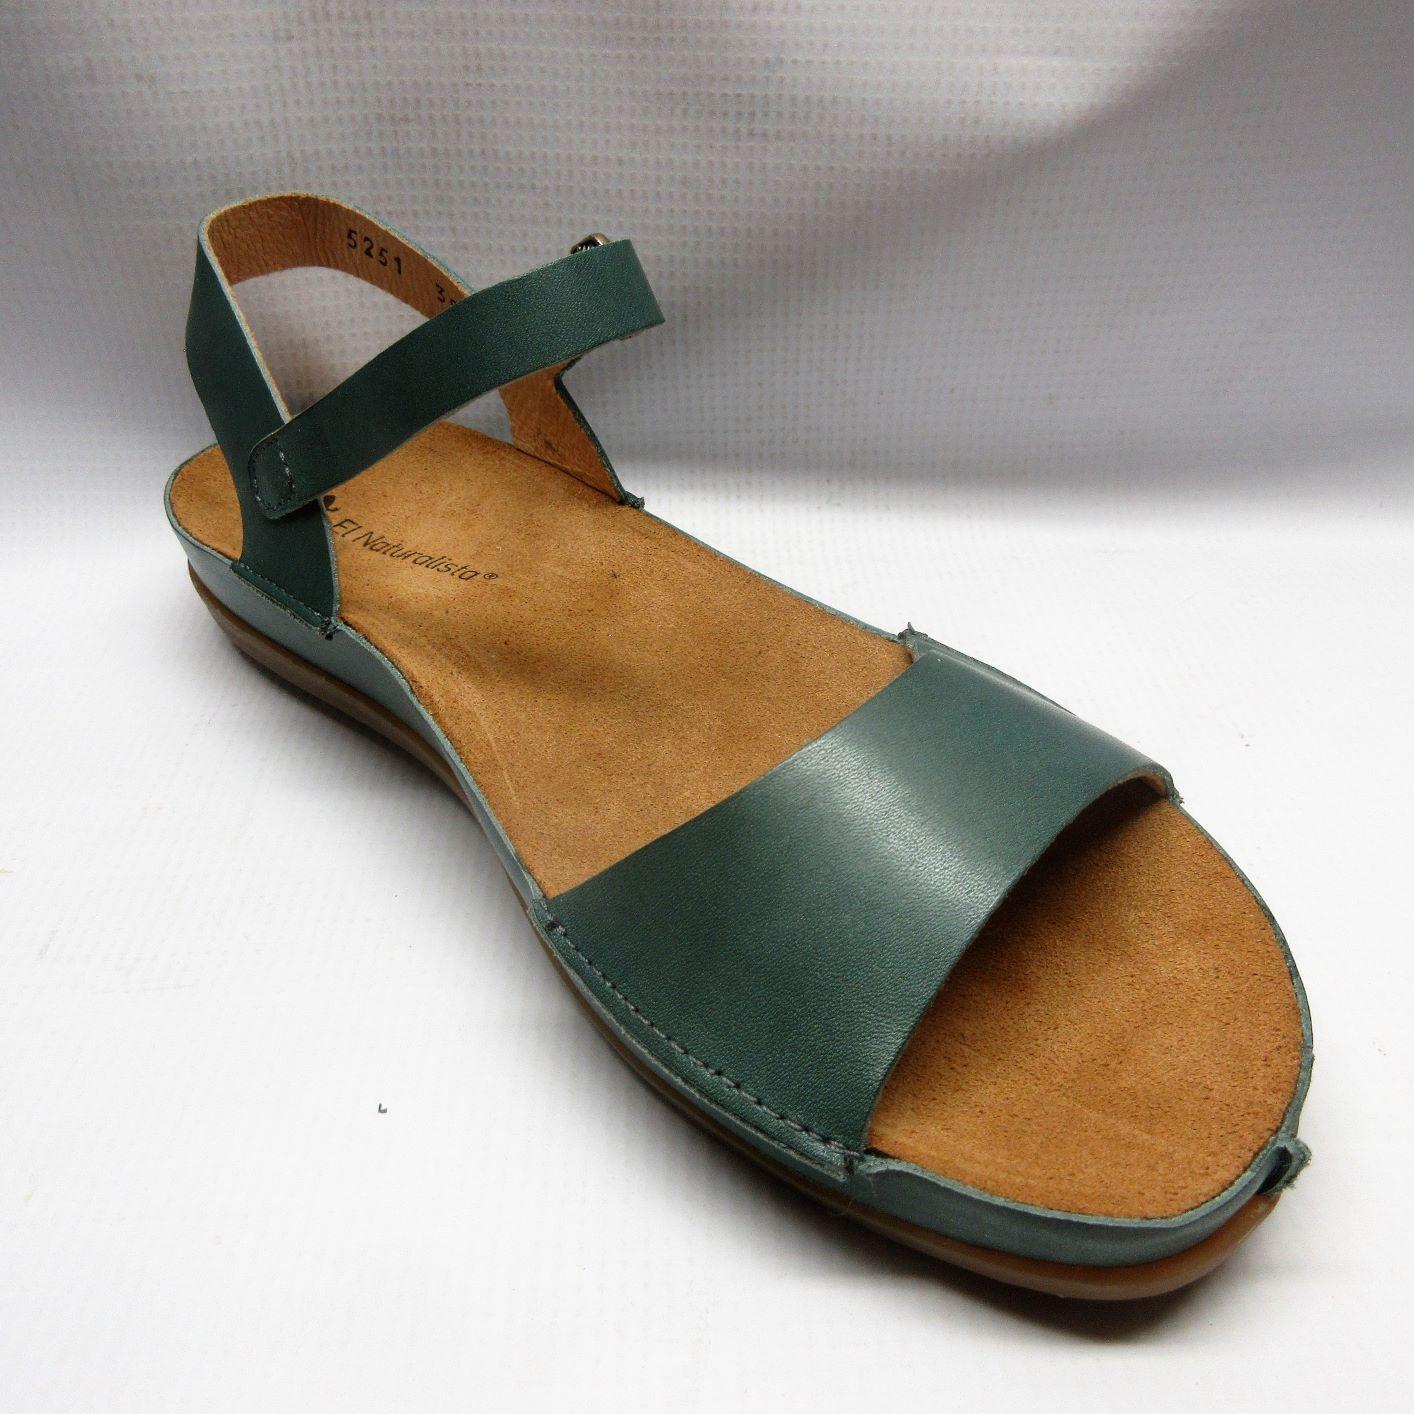 In Sandals Women Naturalista Vaquetilla Plome El N5251 ulKJ35FT1c